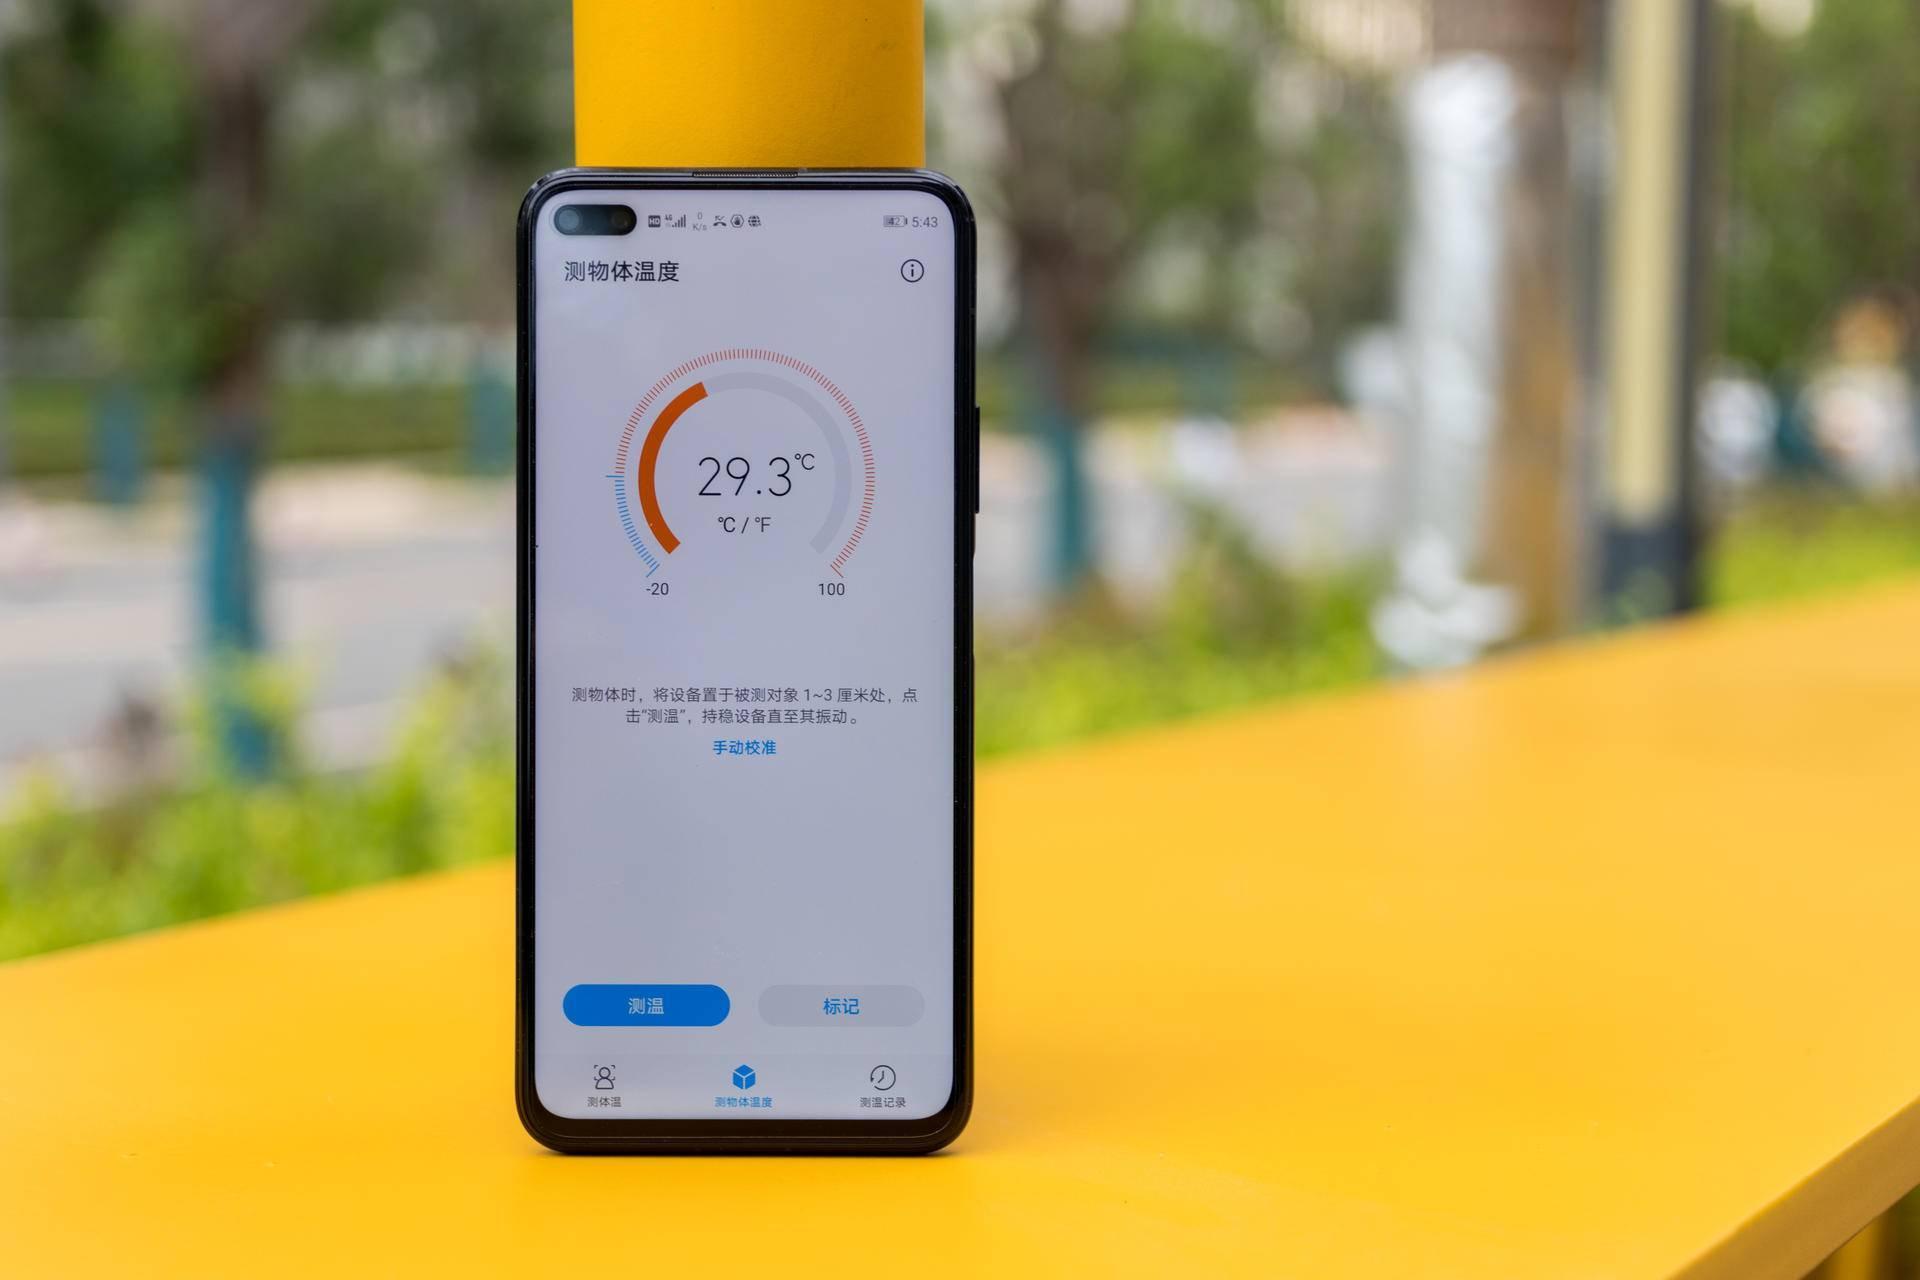 vivo手机-ITMI社区-光彩Play4 Pro 红外测温版是噱头还是实用?一文告诉你(31)